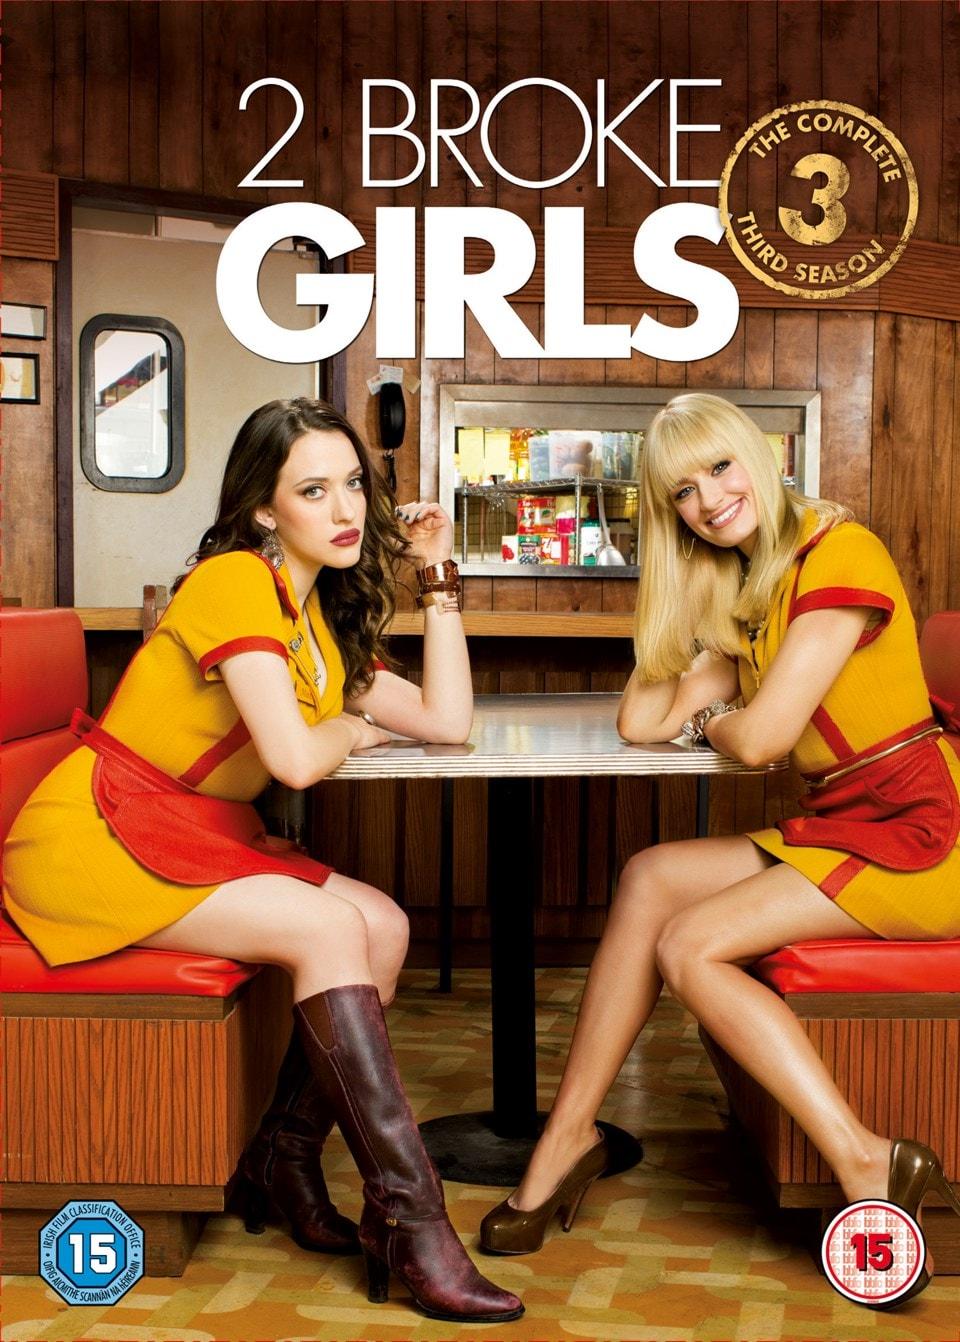 2 Broke Girls: The Complete Third Season - 1